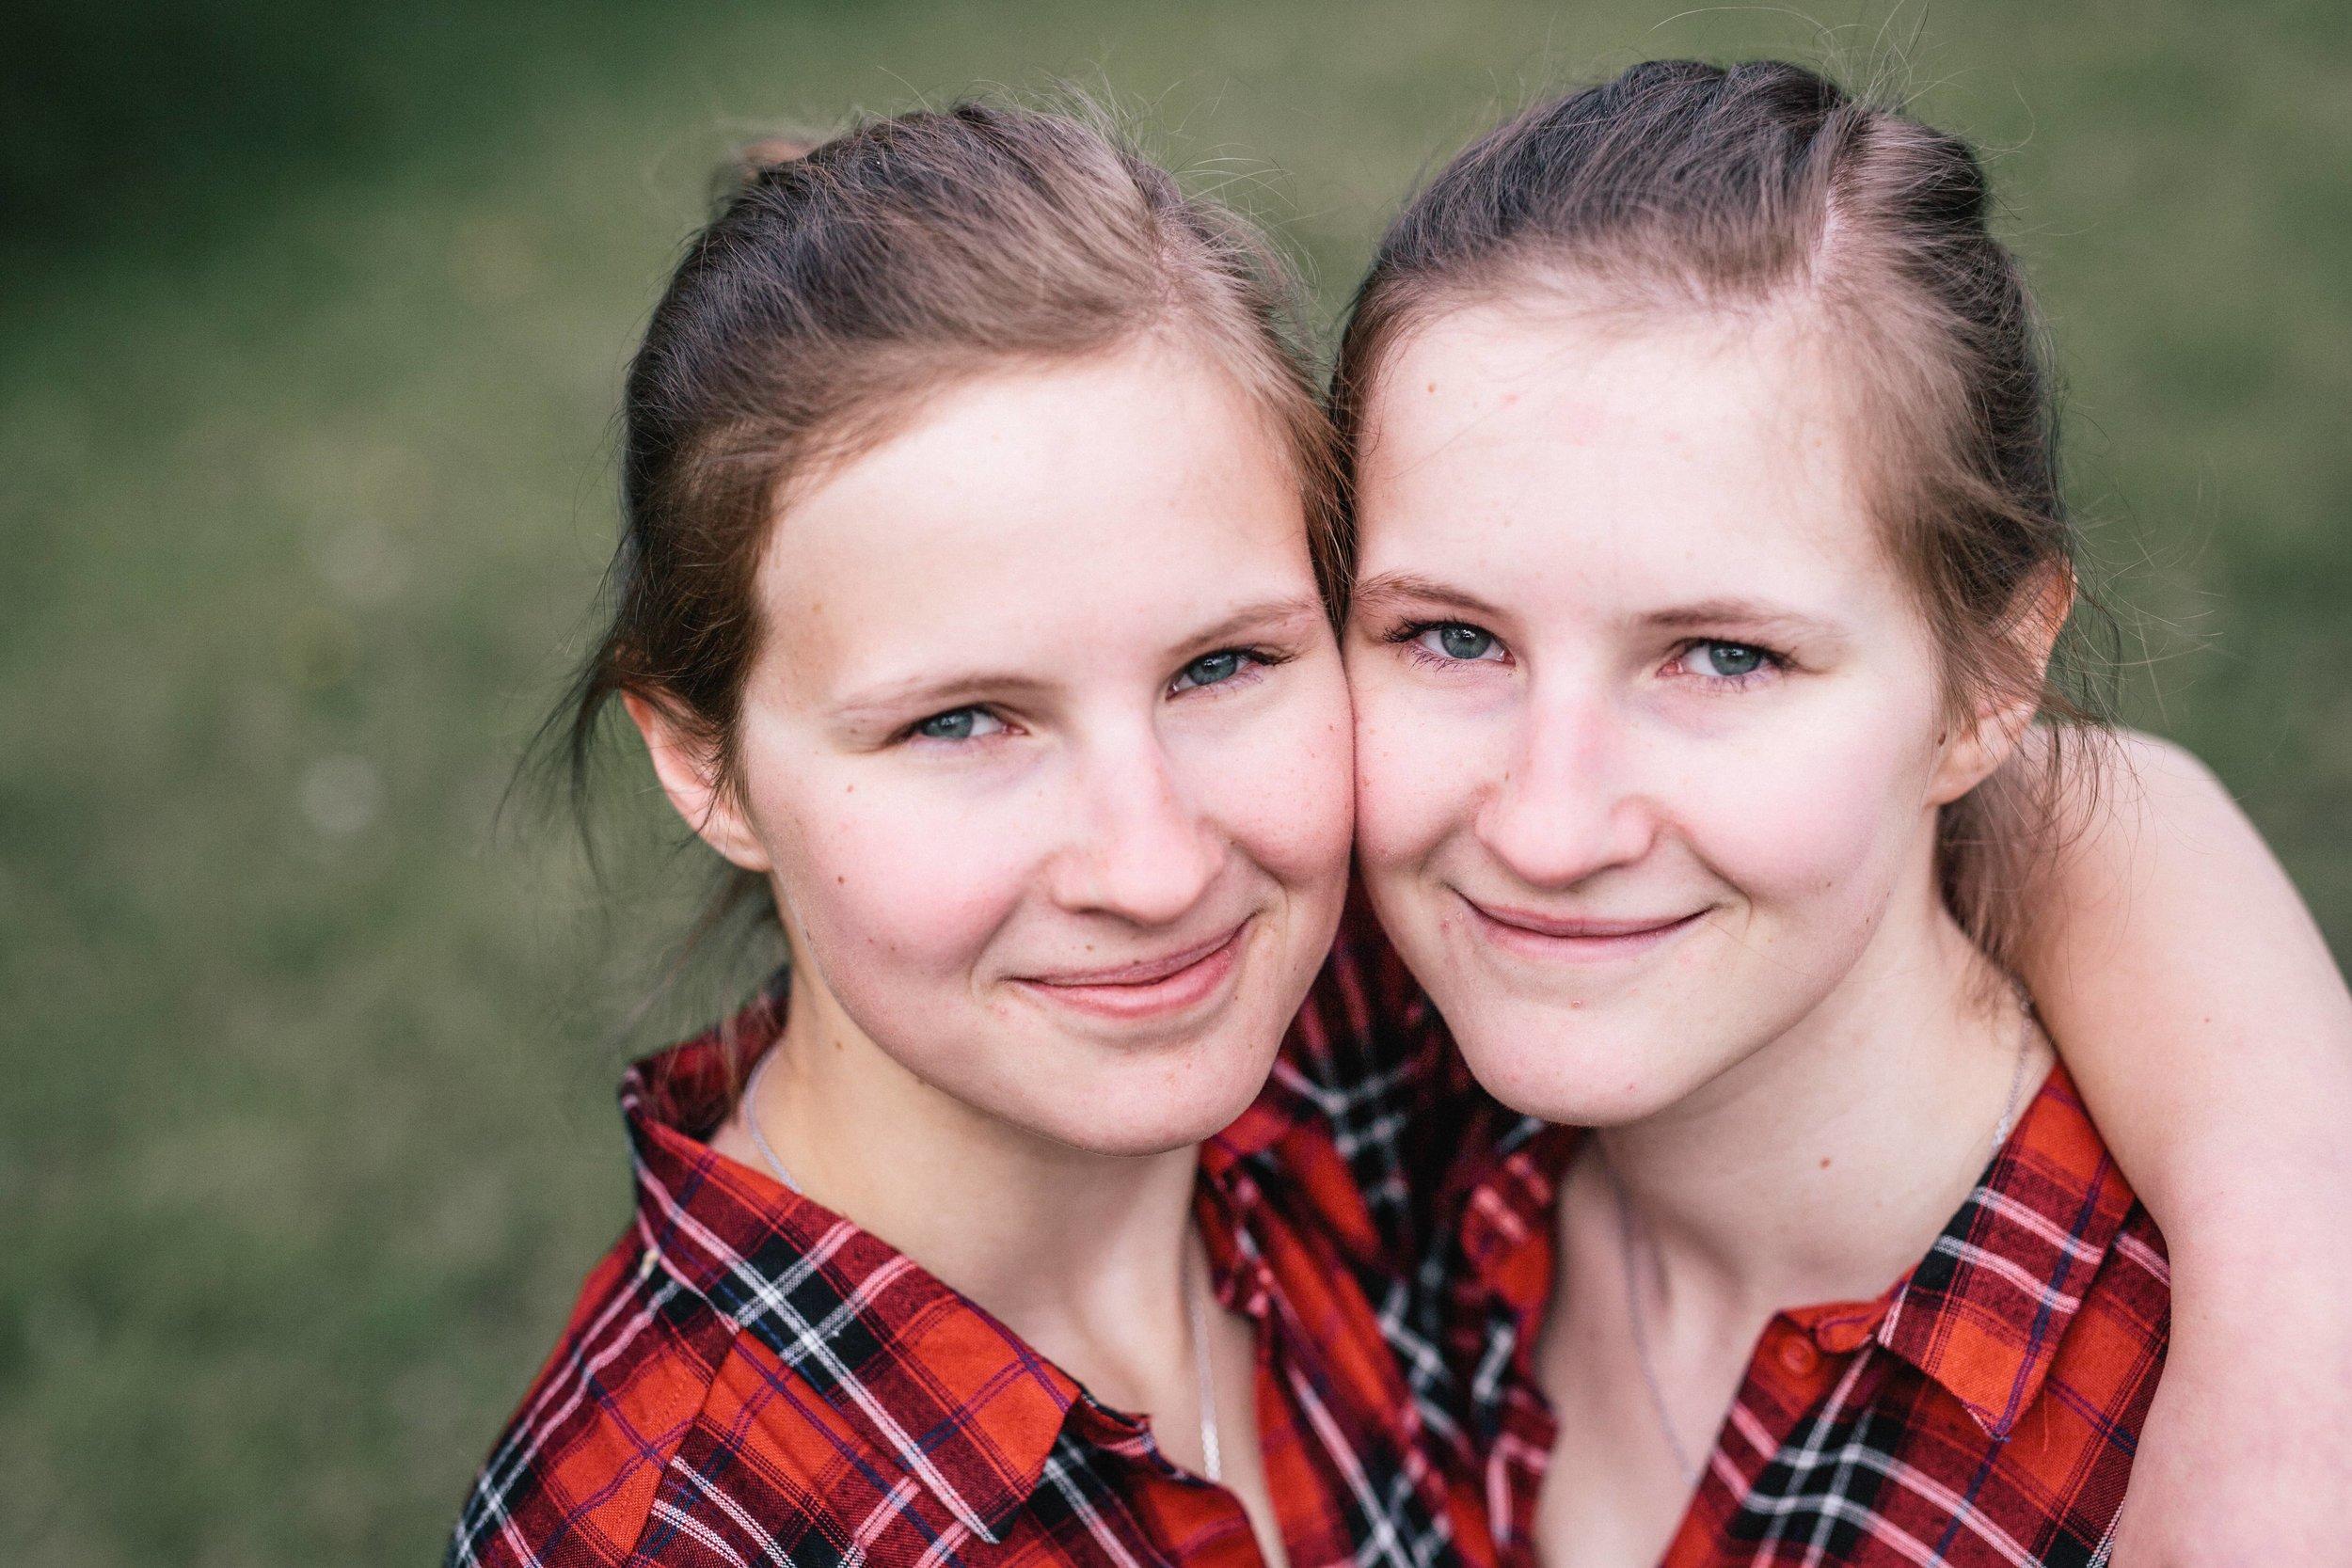 Zwillinge-47.jpg